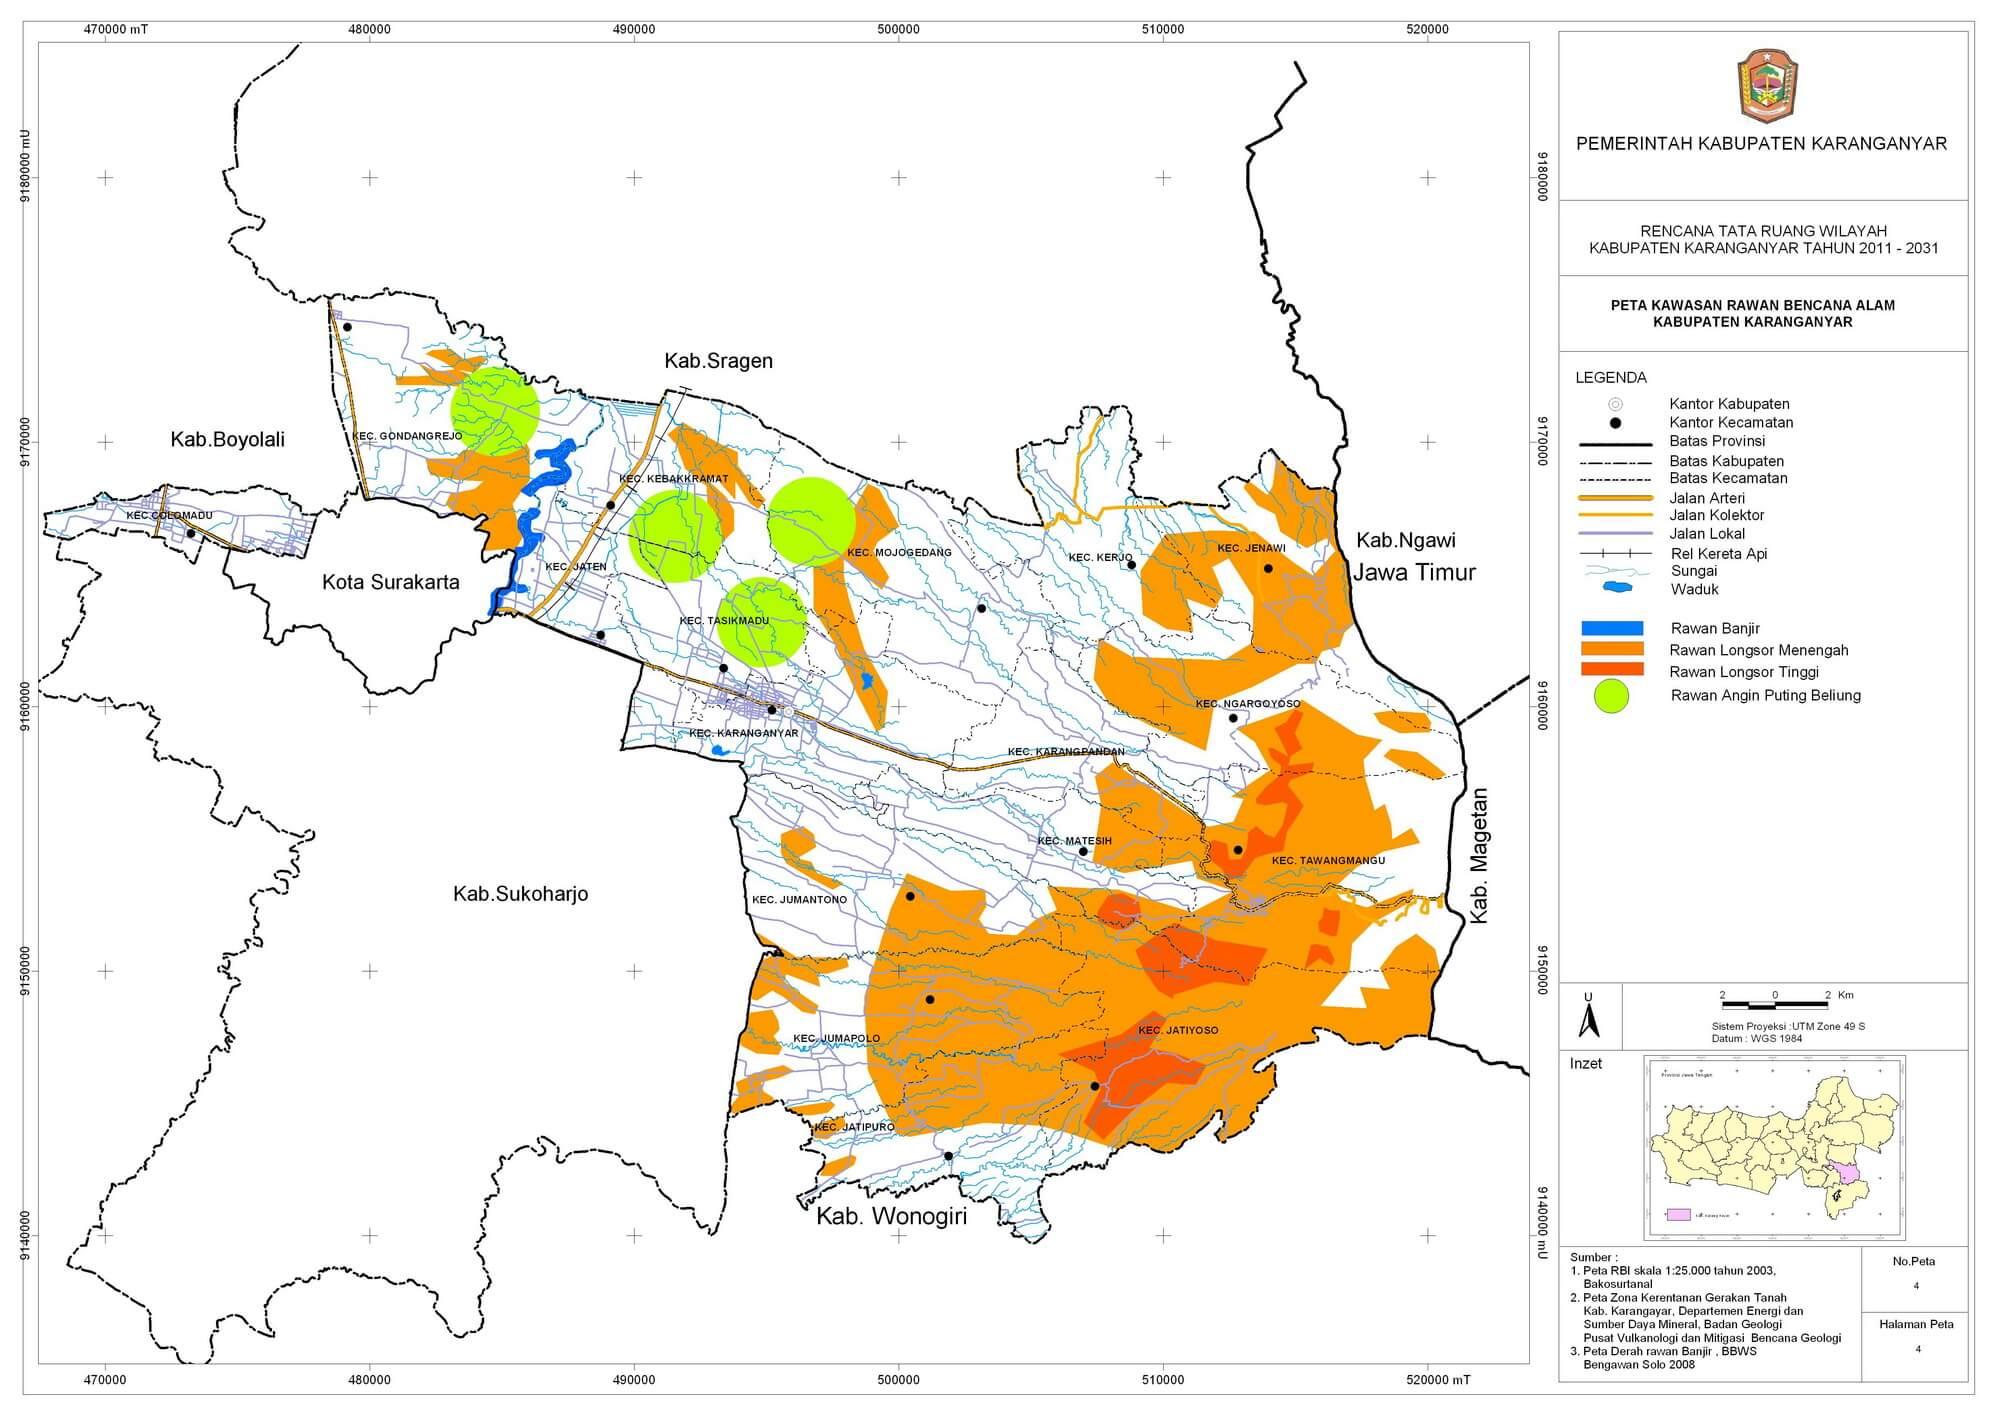 Peta Kawasan Rawan Bencana Alam